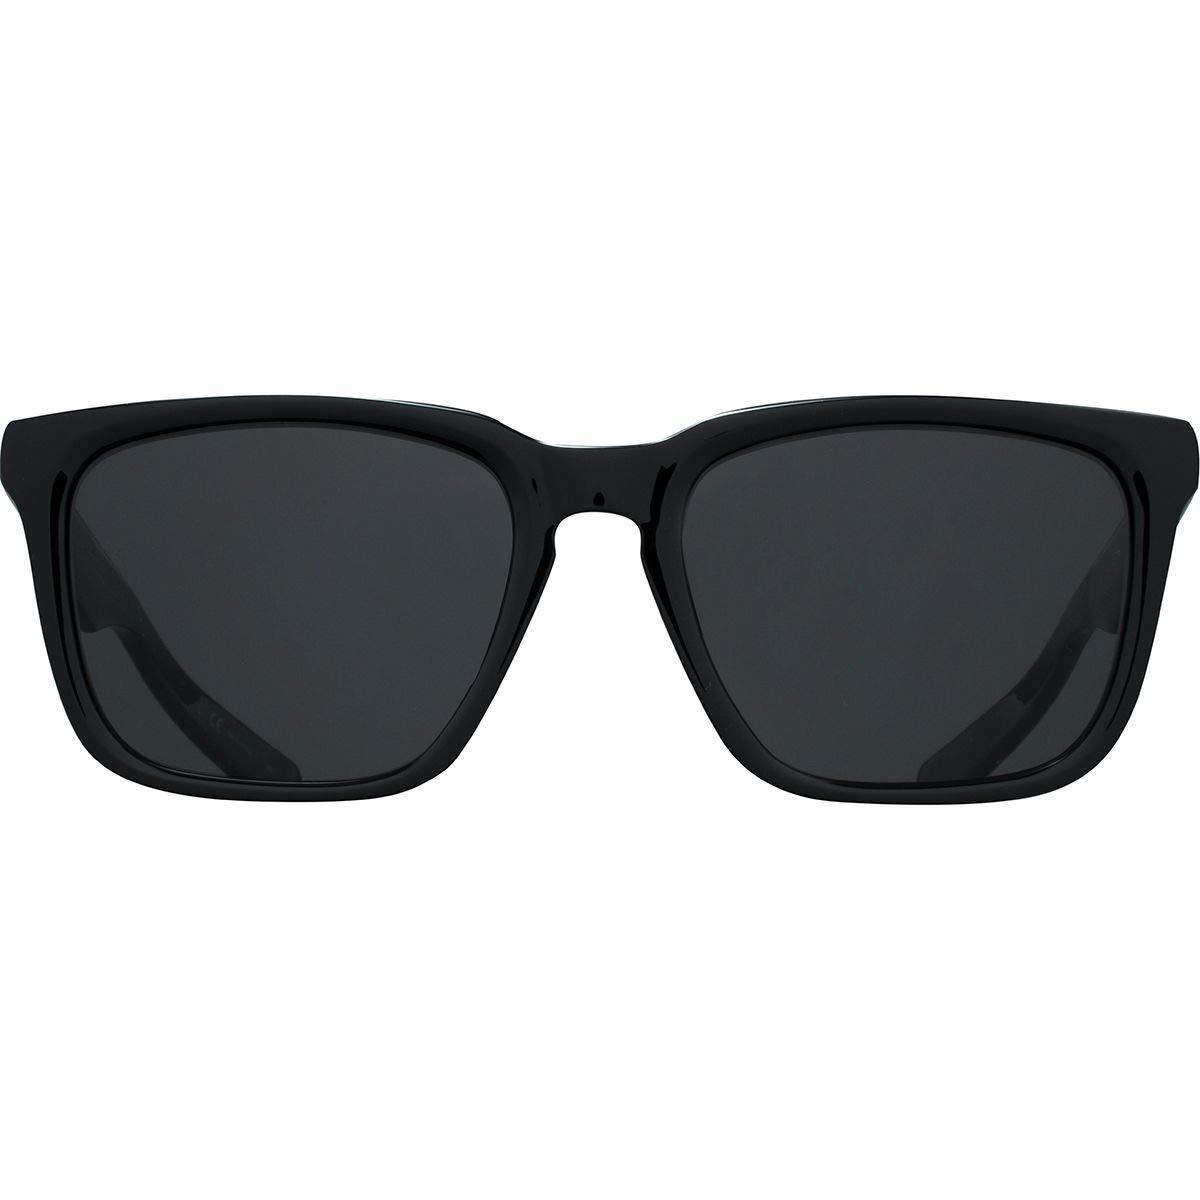 05c2a4693c55 Dragon Baile Polarized Sunglasses at Amazon Women s Clothing store